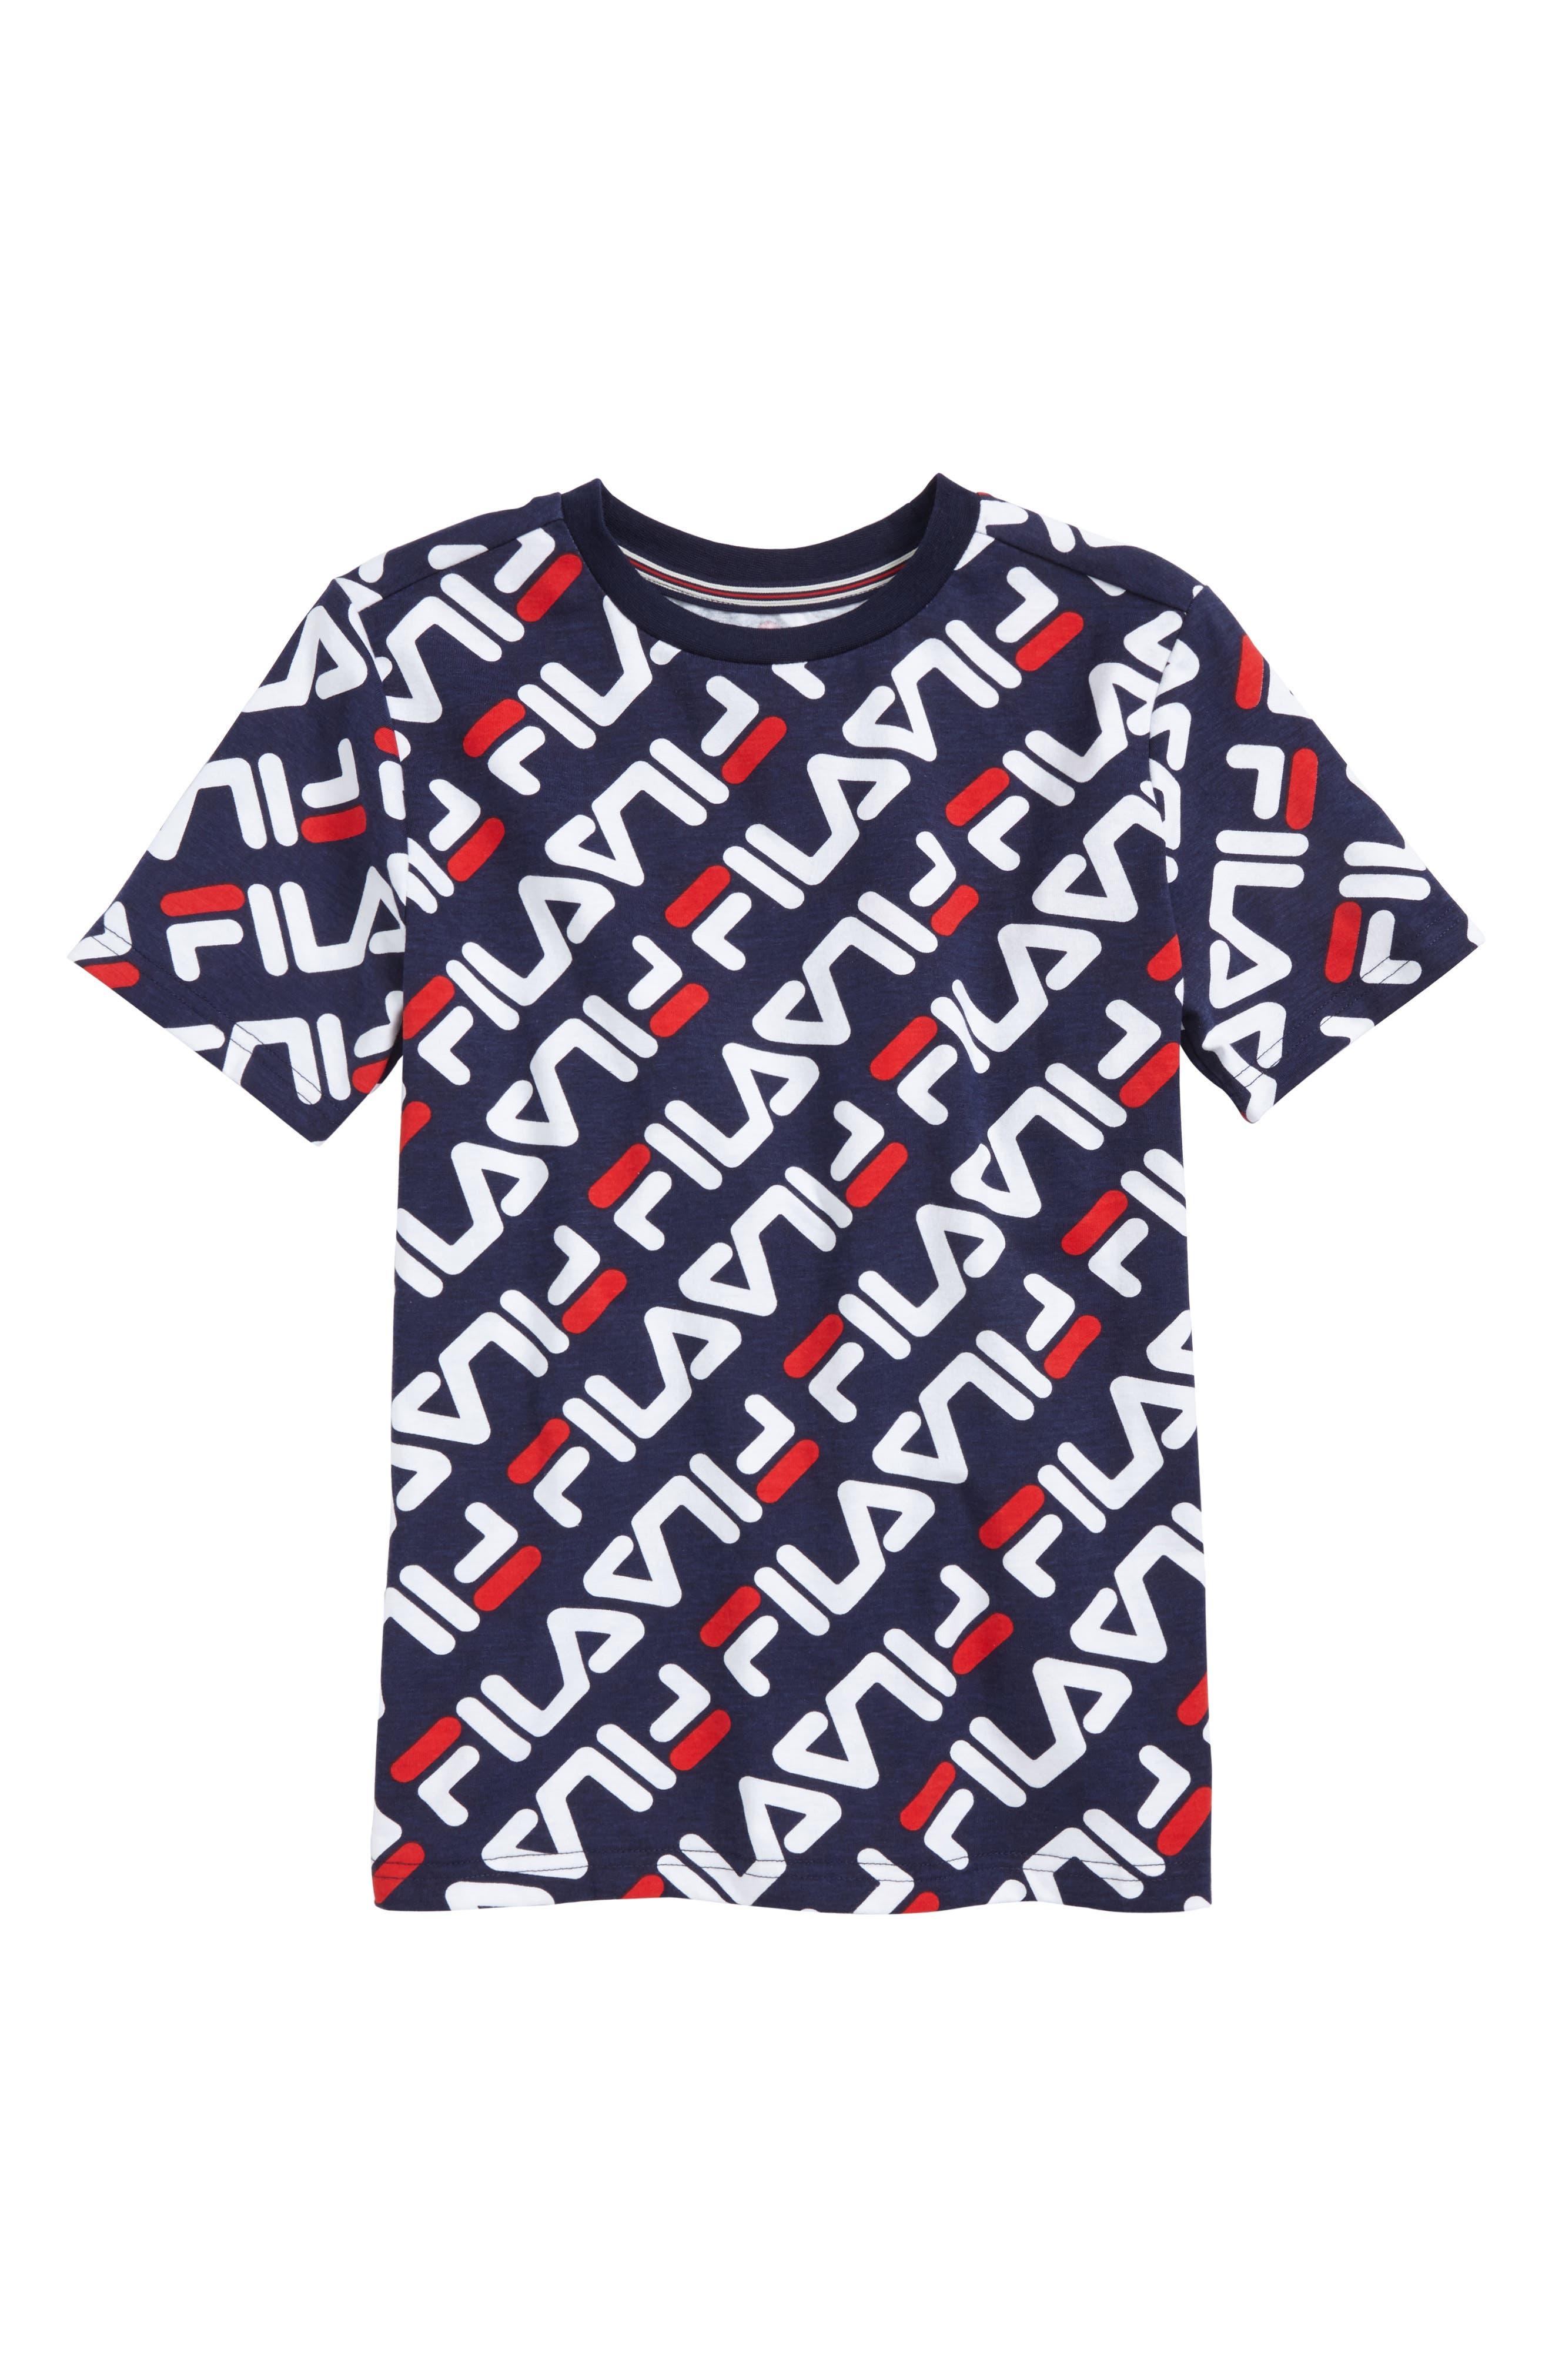 Alternate Image 1 Selected - FILA Angled Logo Print T-Shirt (Big Boys)